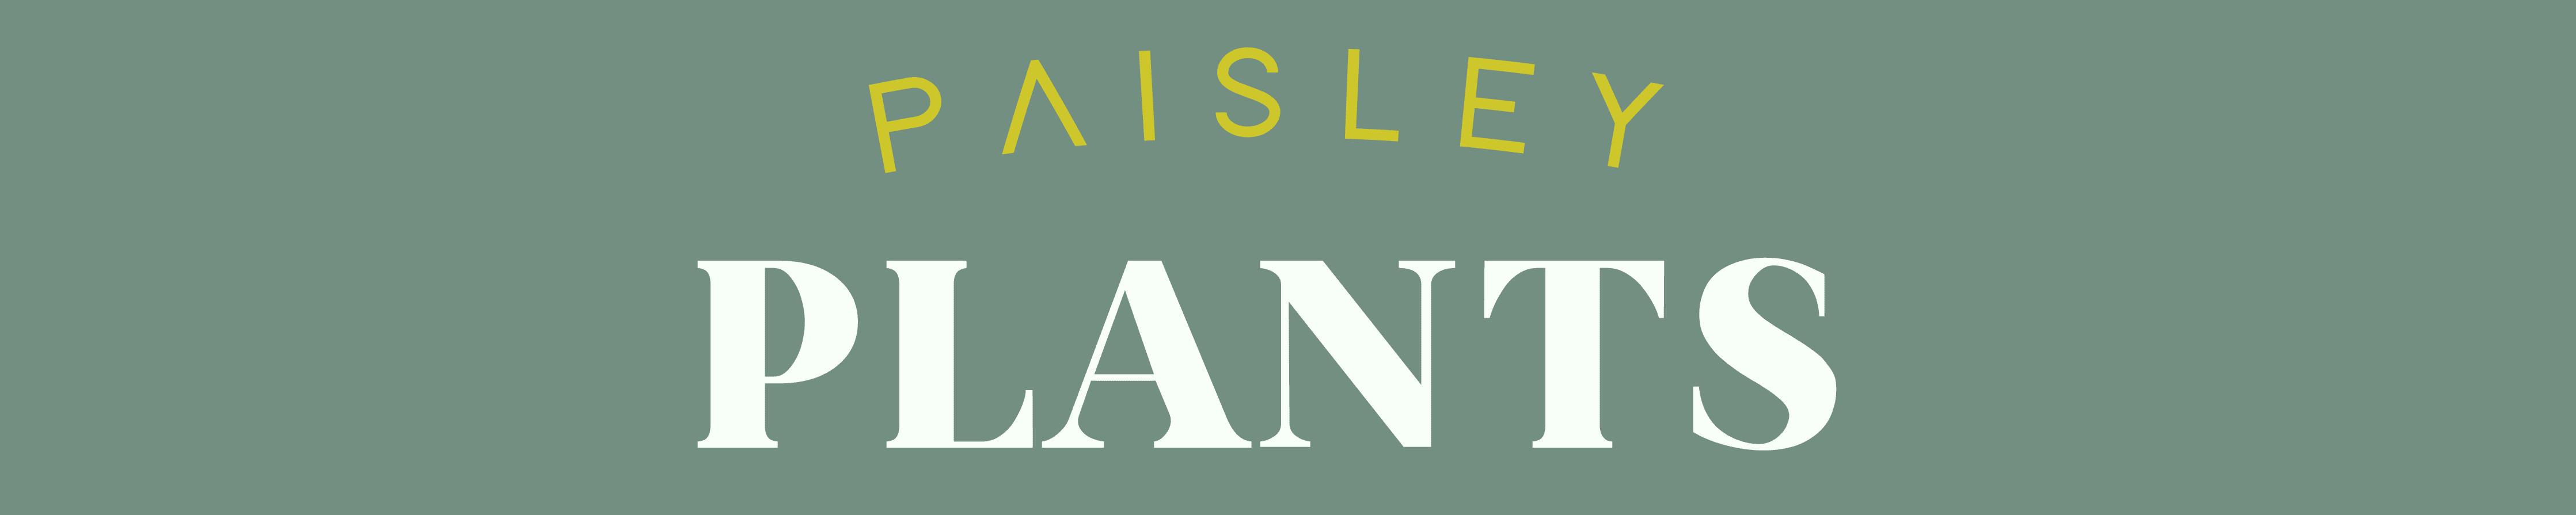 Paisley Plants